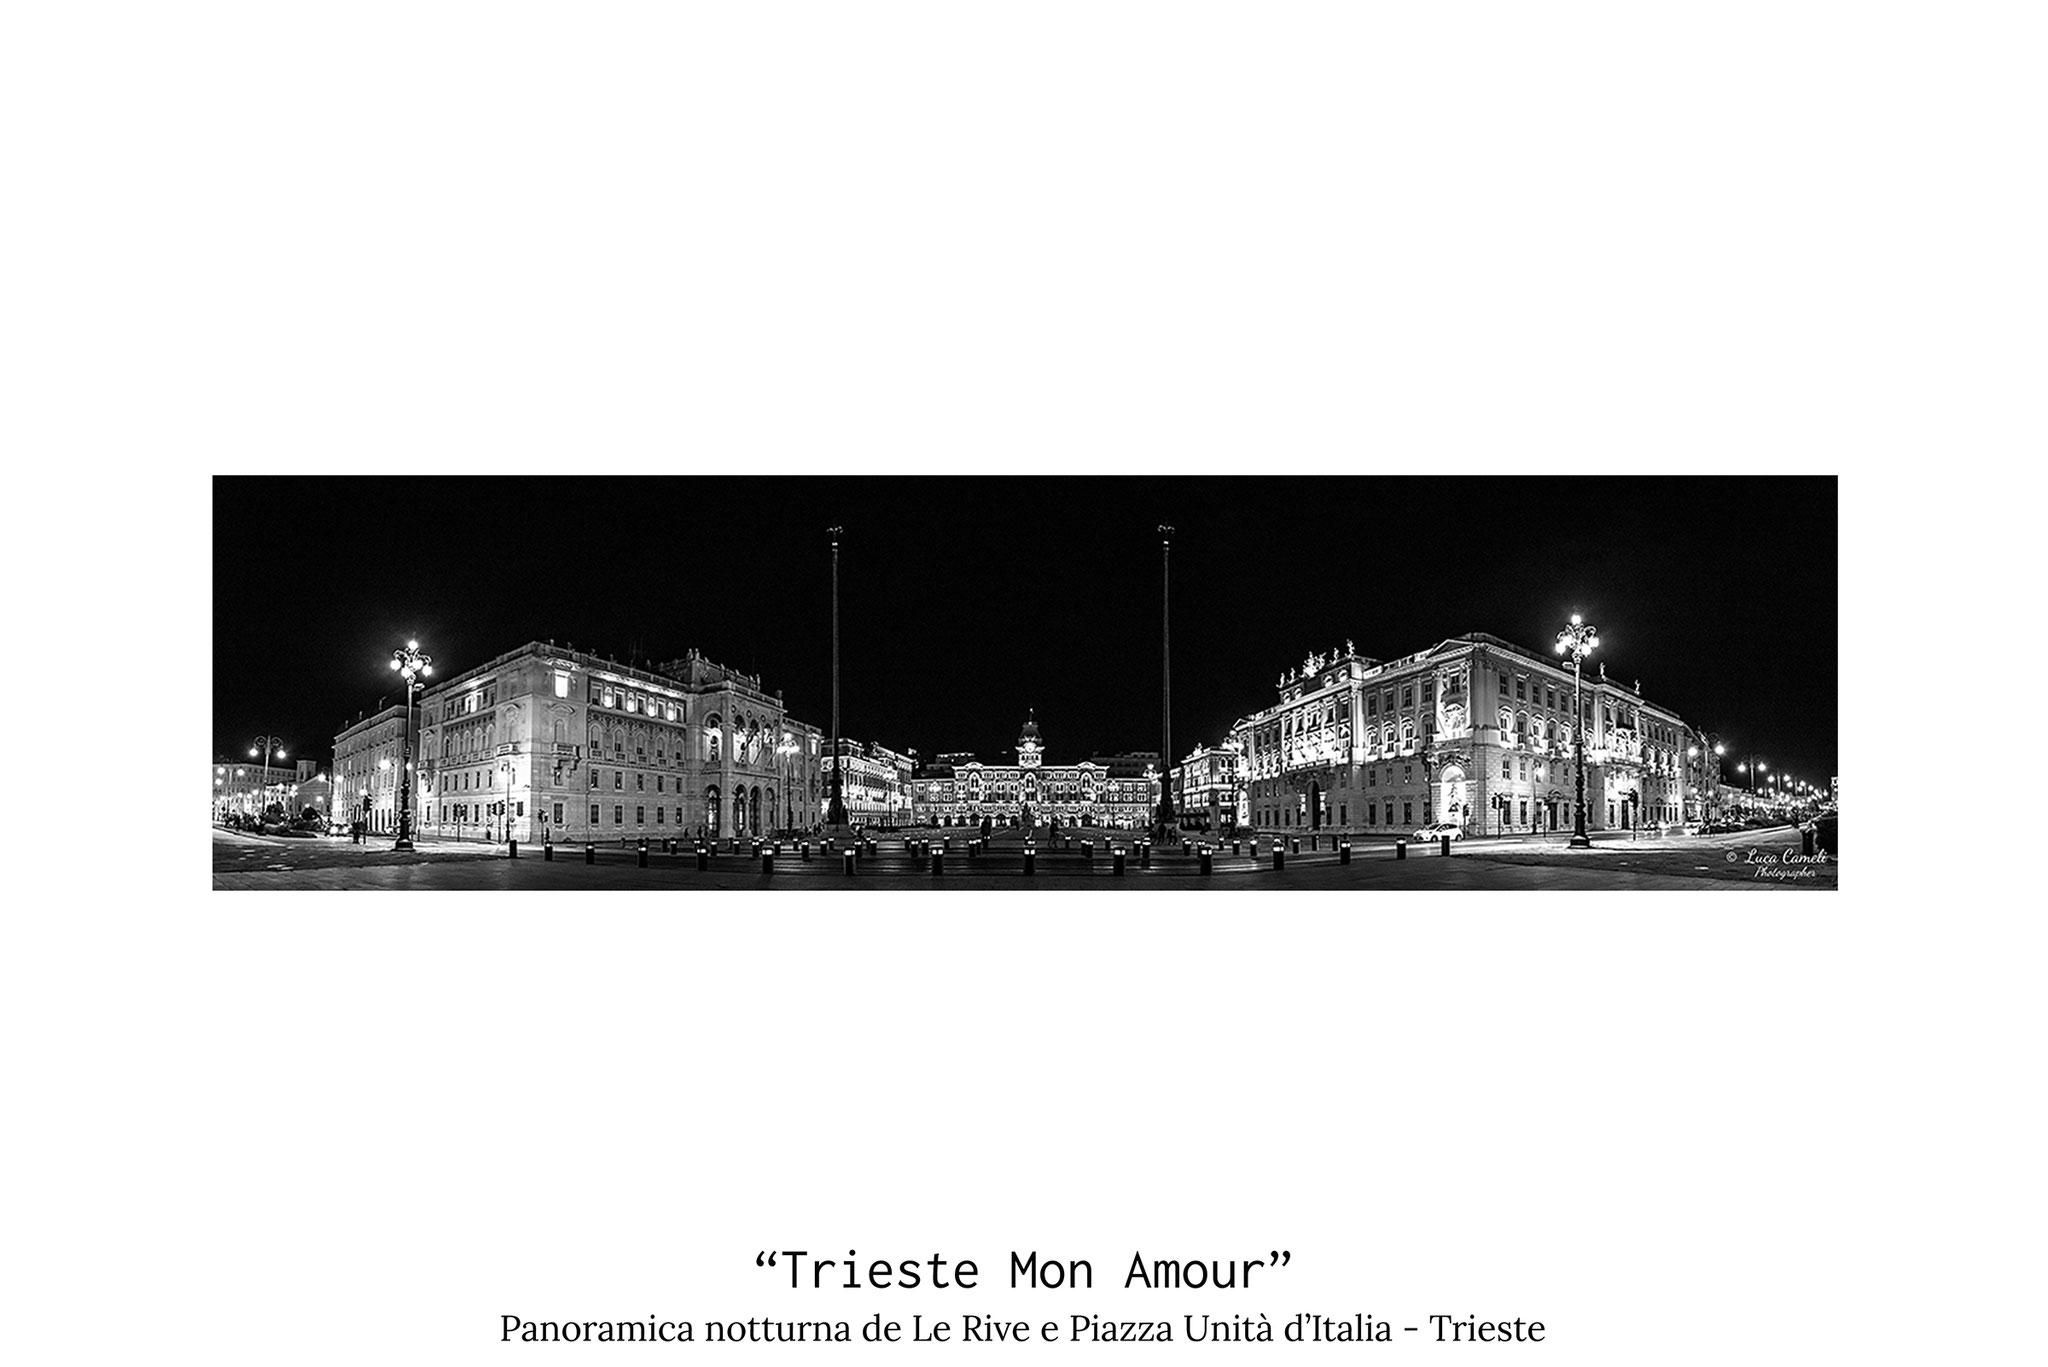 """Trieste Mon Amour"", Panoramica notturna di Piazza Unità d'Italia e de Le Rive. © Luca Cameli Photographer"